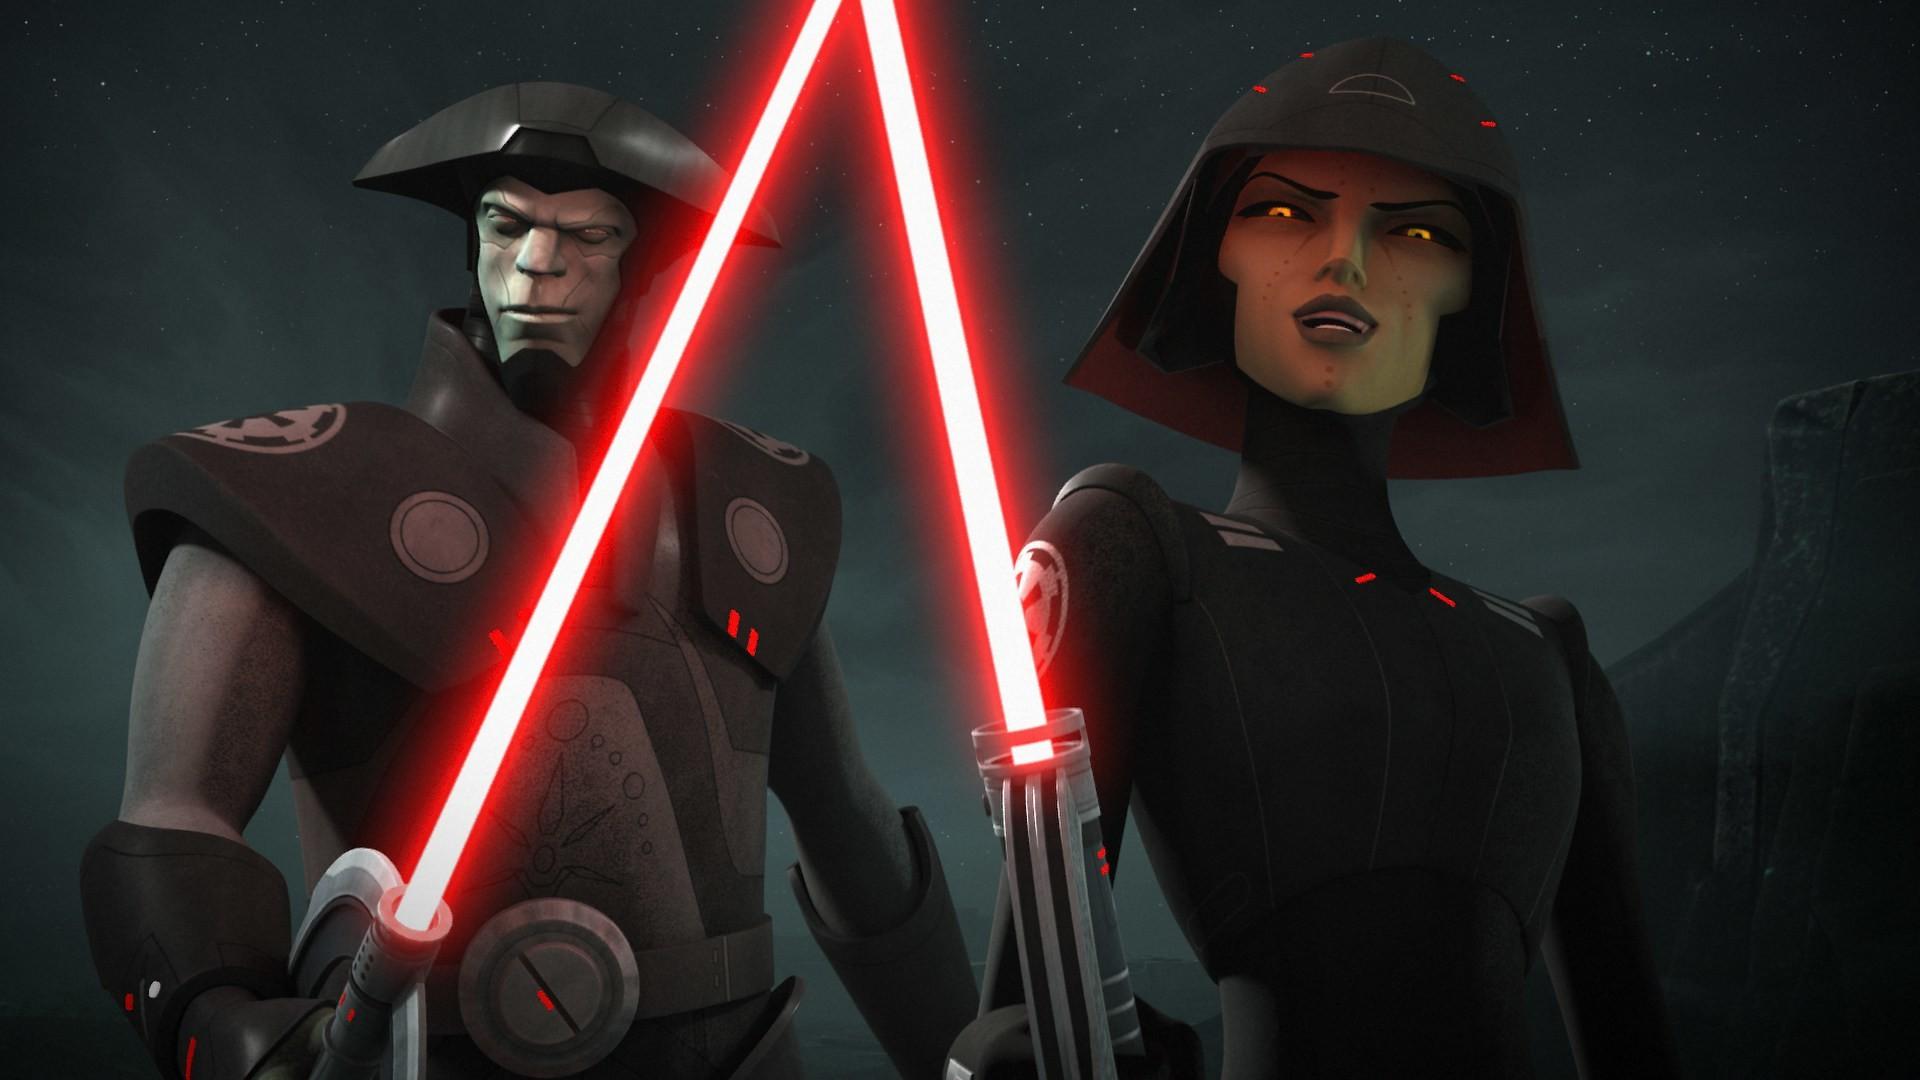 New 'Star Wars Rebels' Clip Featuring Ahsoka, Ezra, And Yoda! Heroic